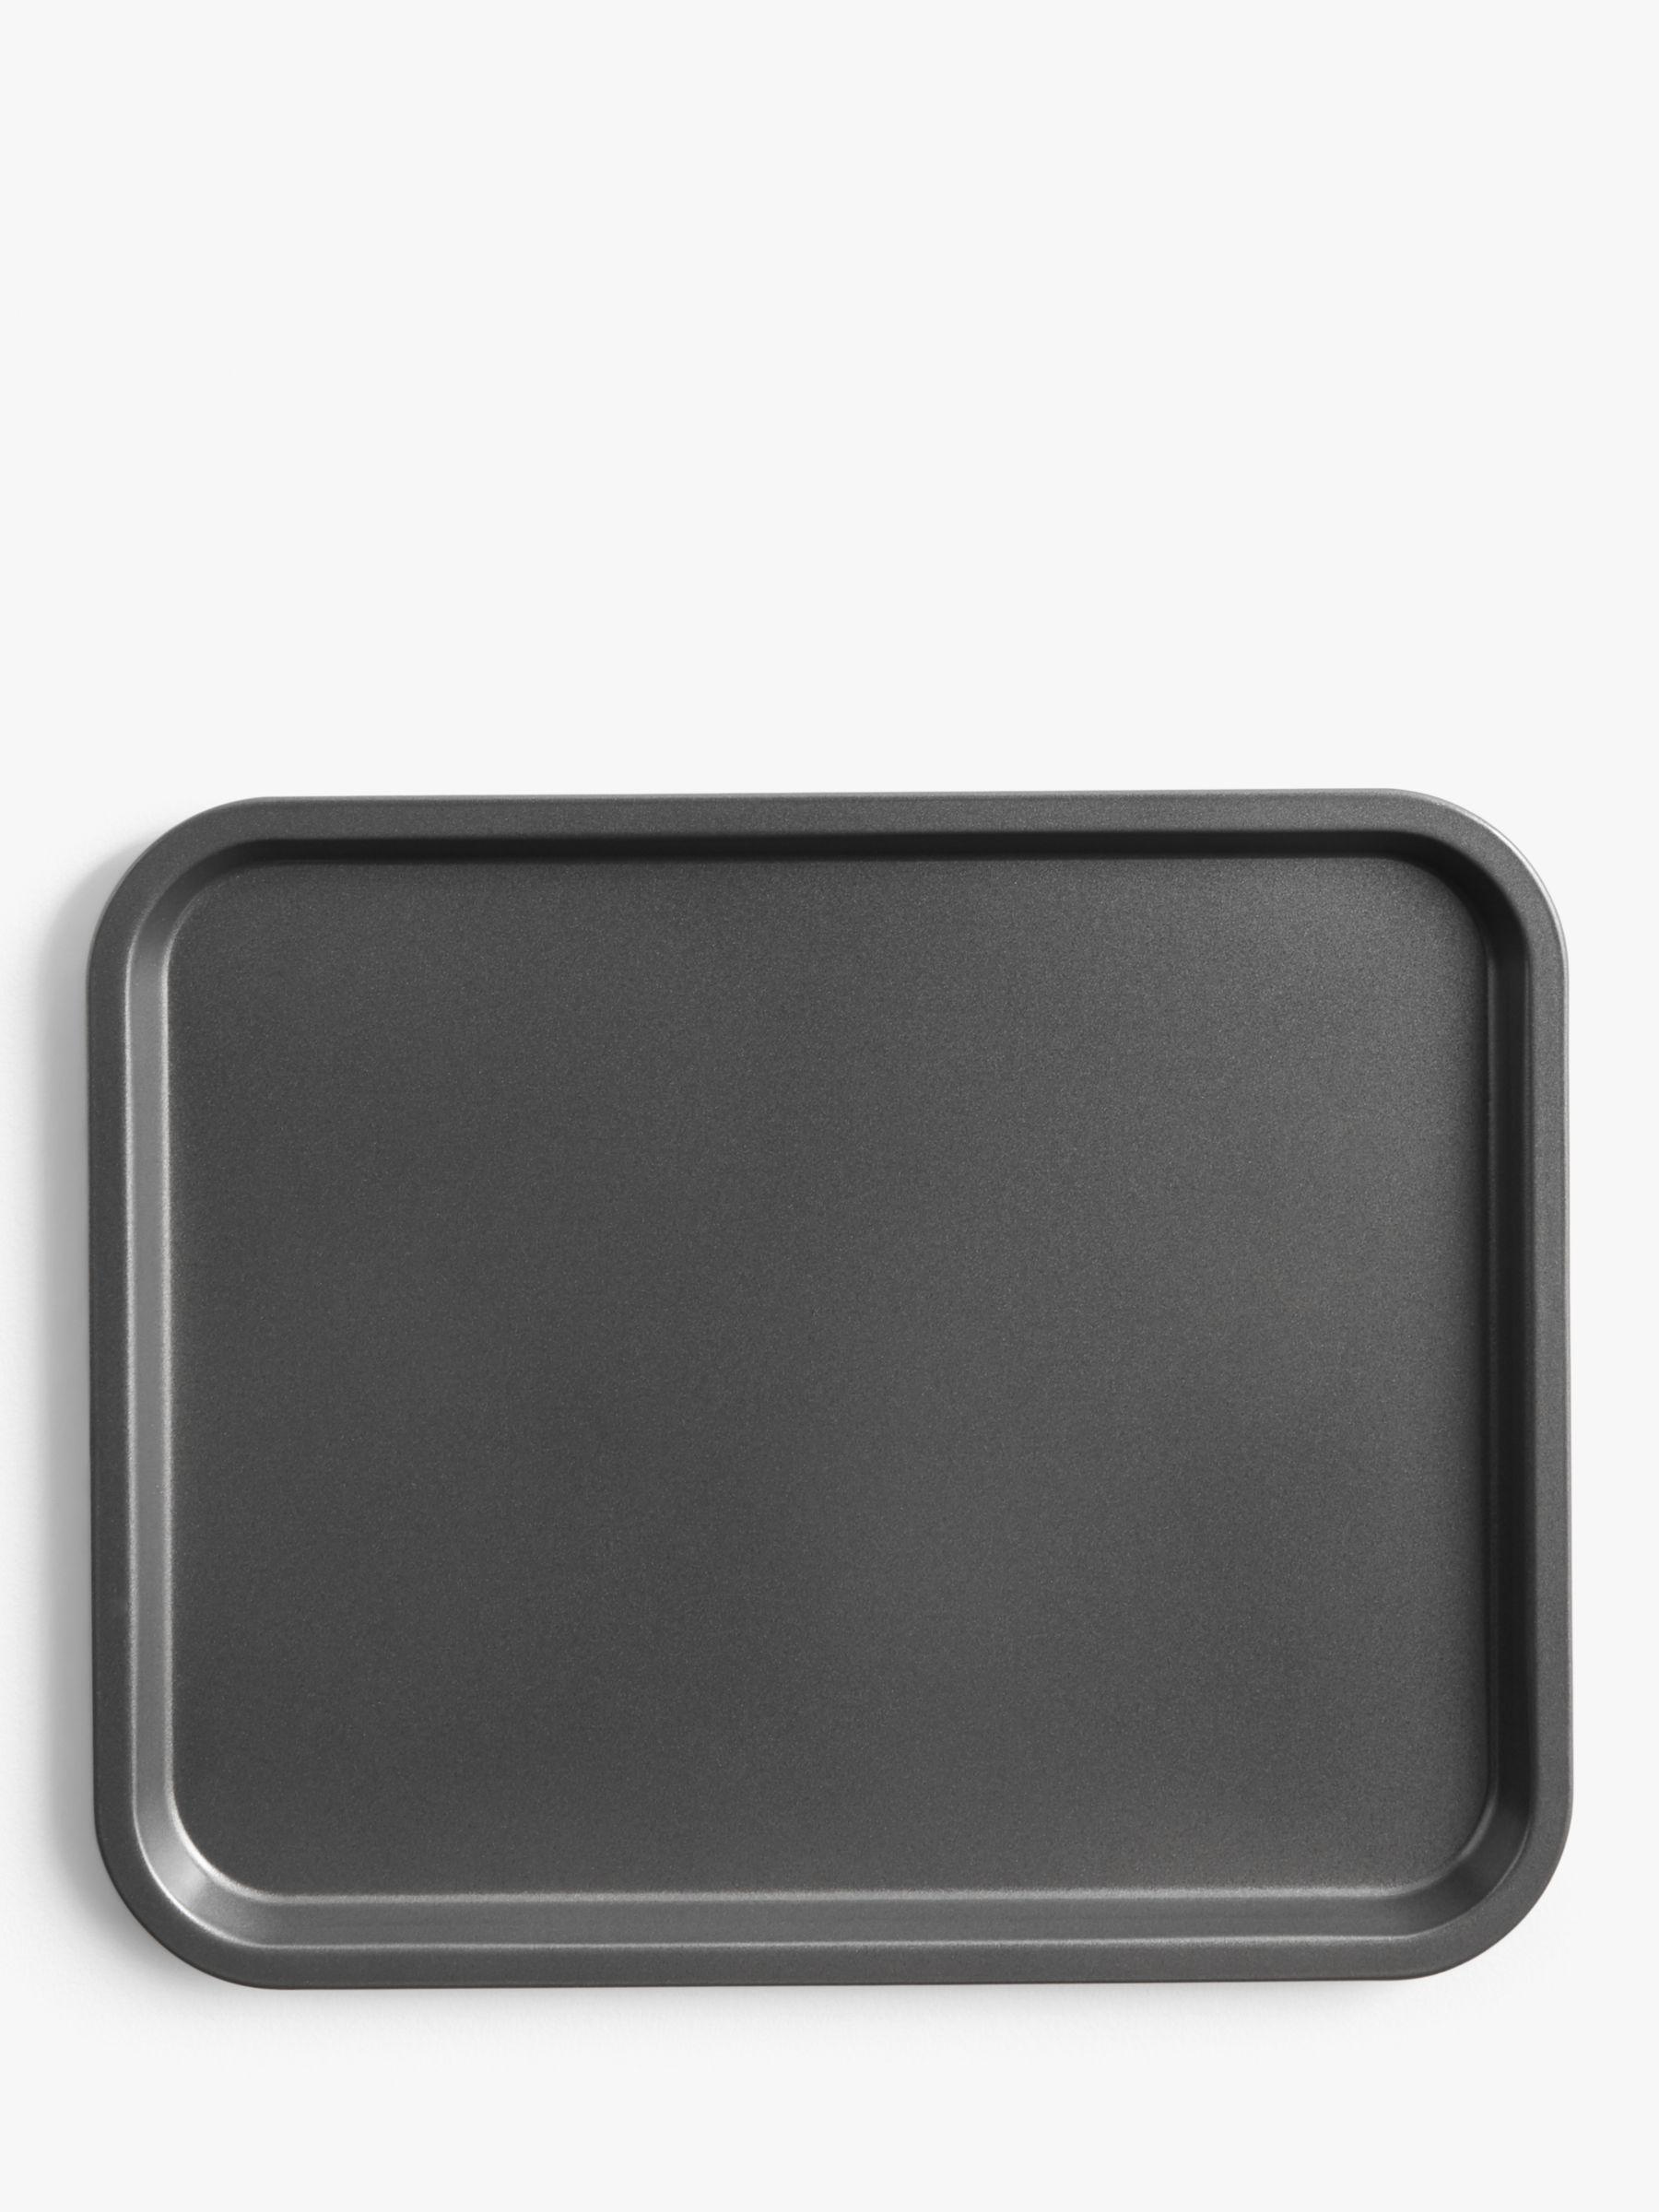 John Lewis & Partners Classic Non-Stick Oven Tray, L36cm